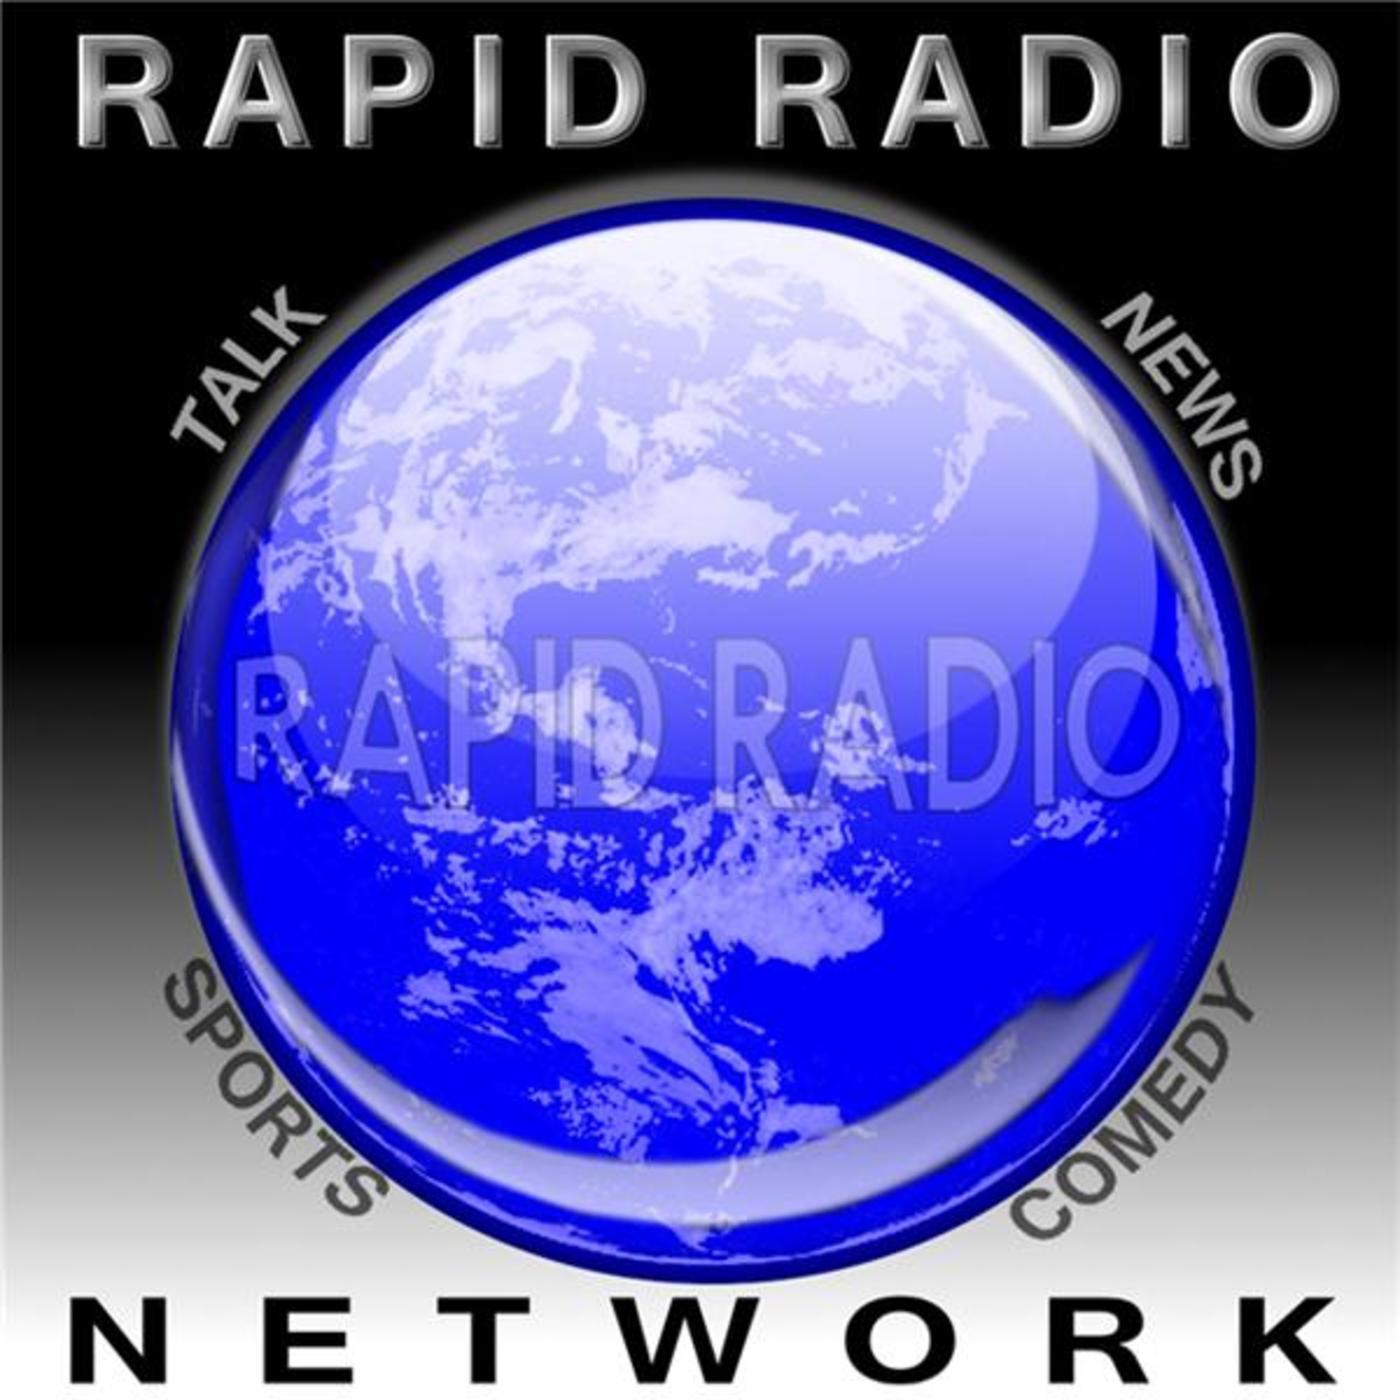 Rapid Radio Network